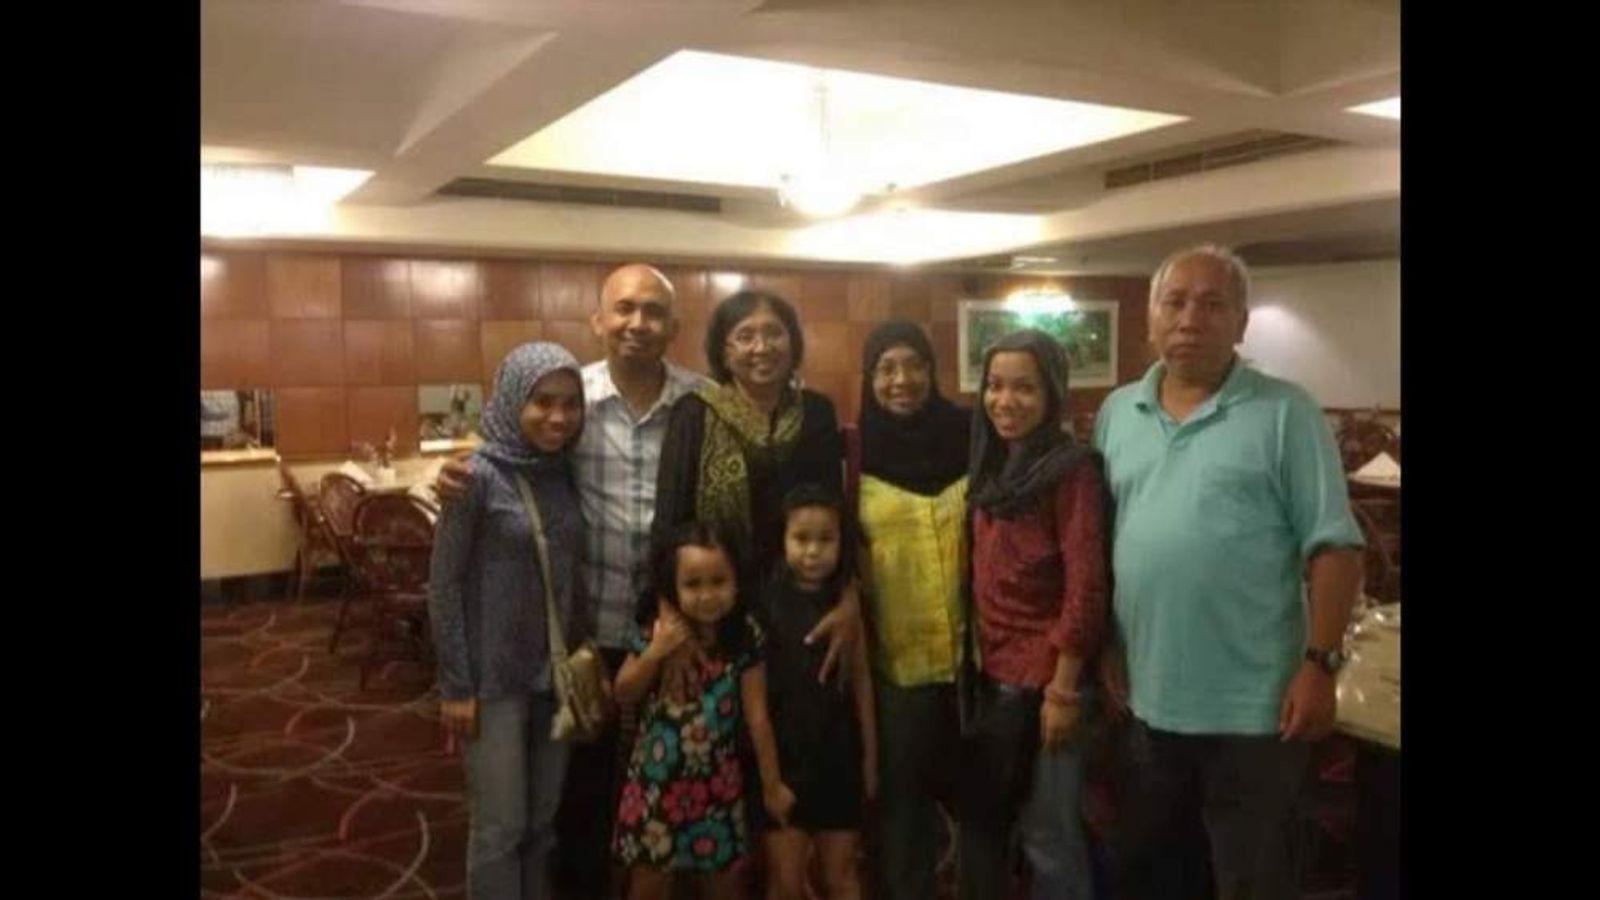 Family photos of Malaysia Airlines pilot Zaharie Ahmad Shah